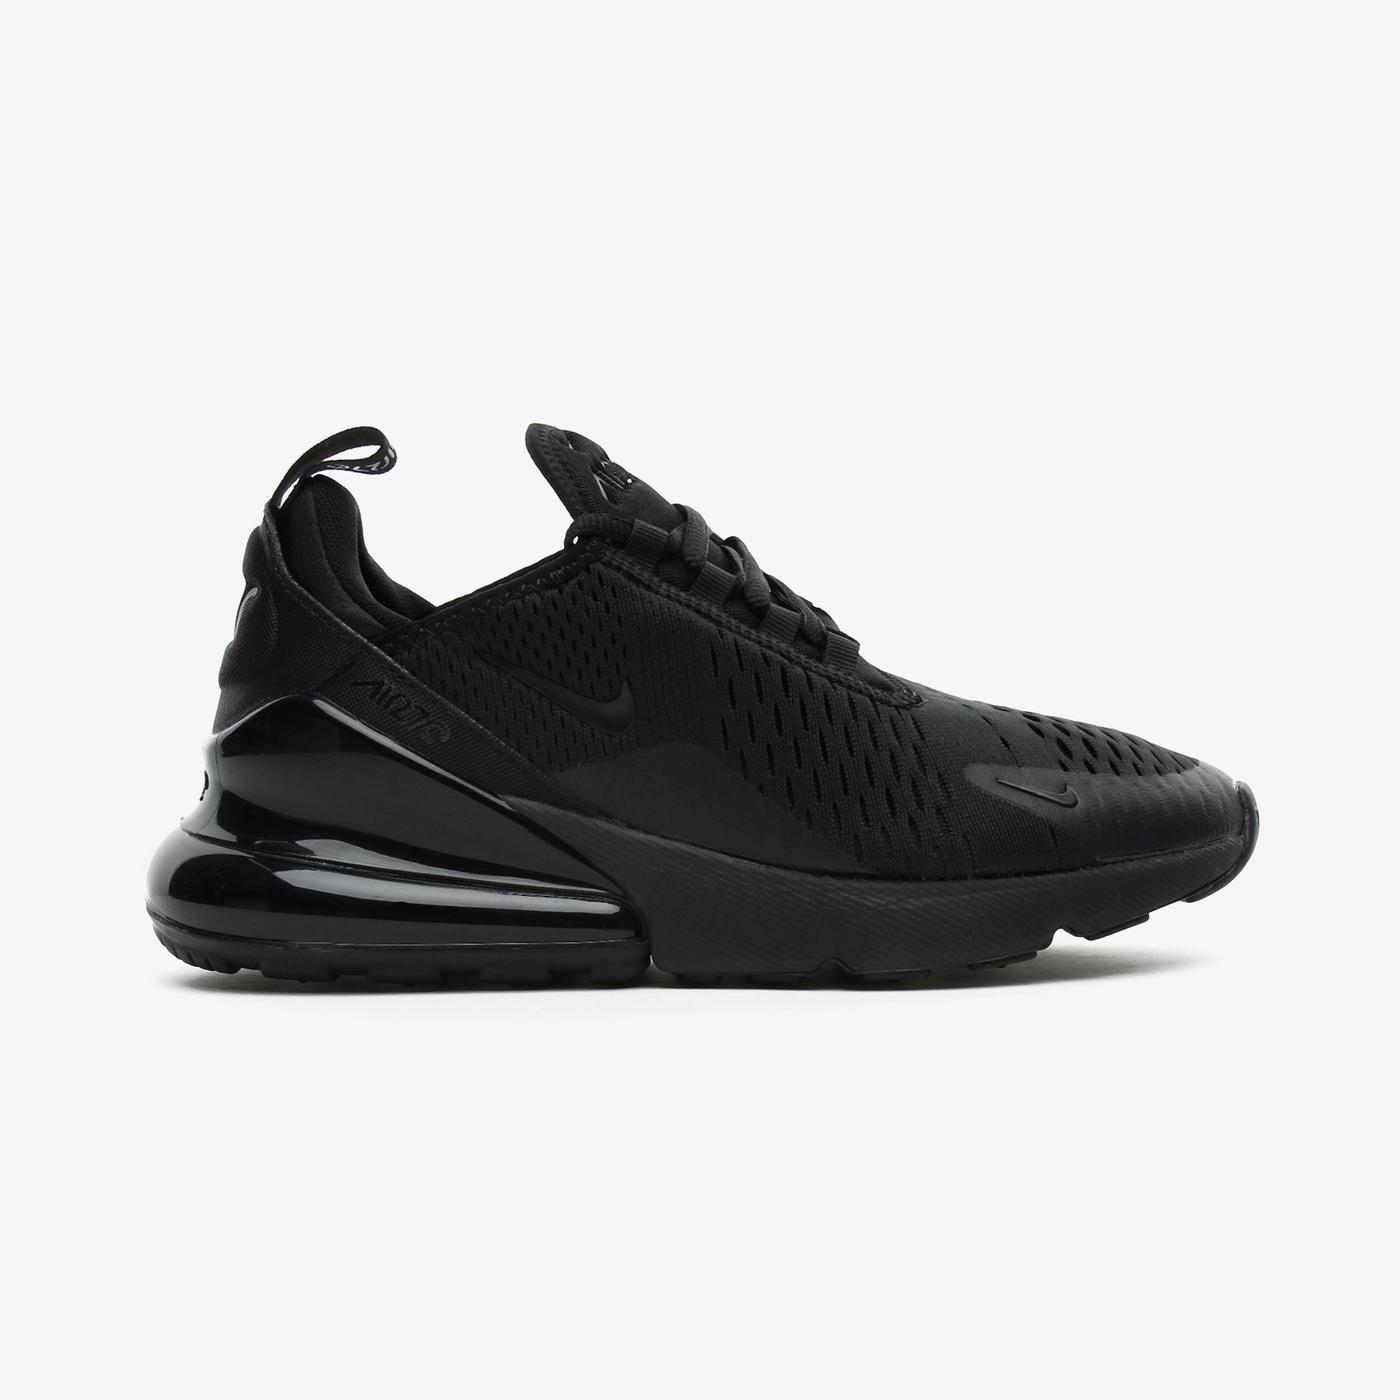 Nike Air Max 270 Gs Kadın Siyah Spor Ayakkabı